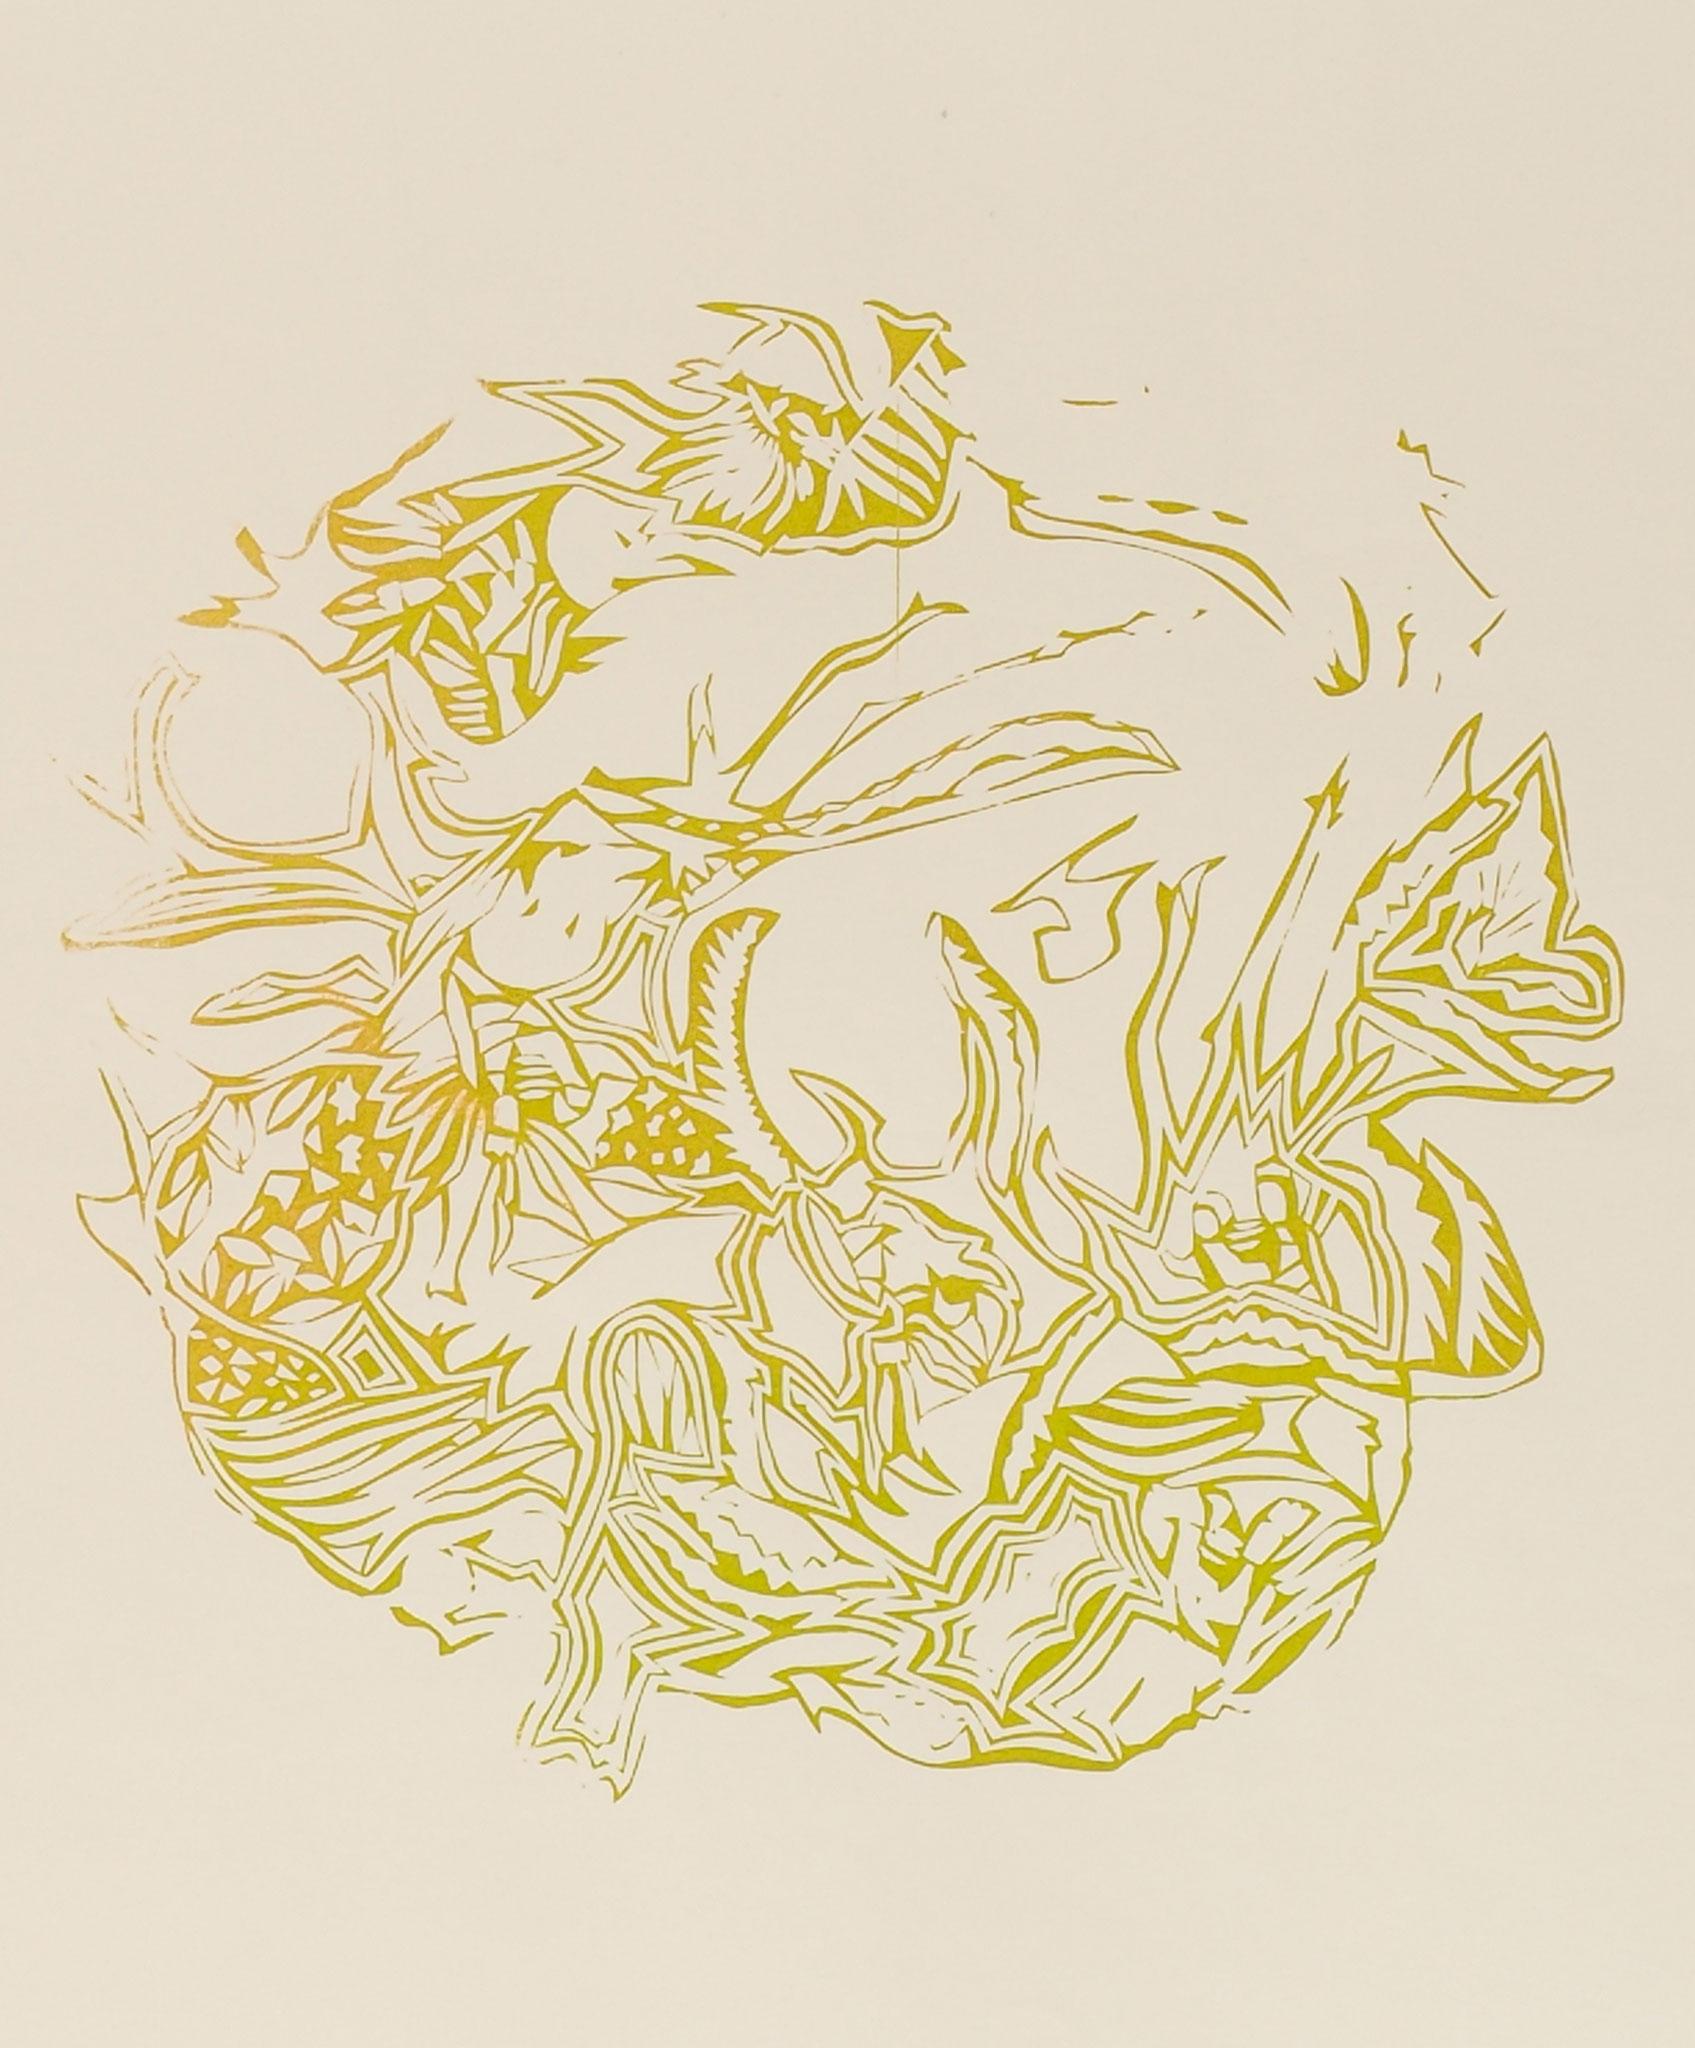 """Vulva"", 2015, Acryl auf Papier"